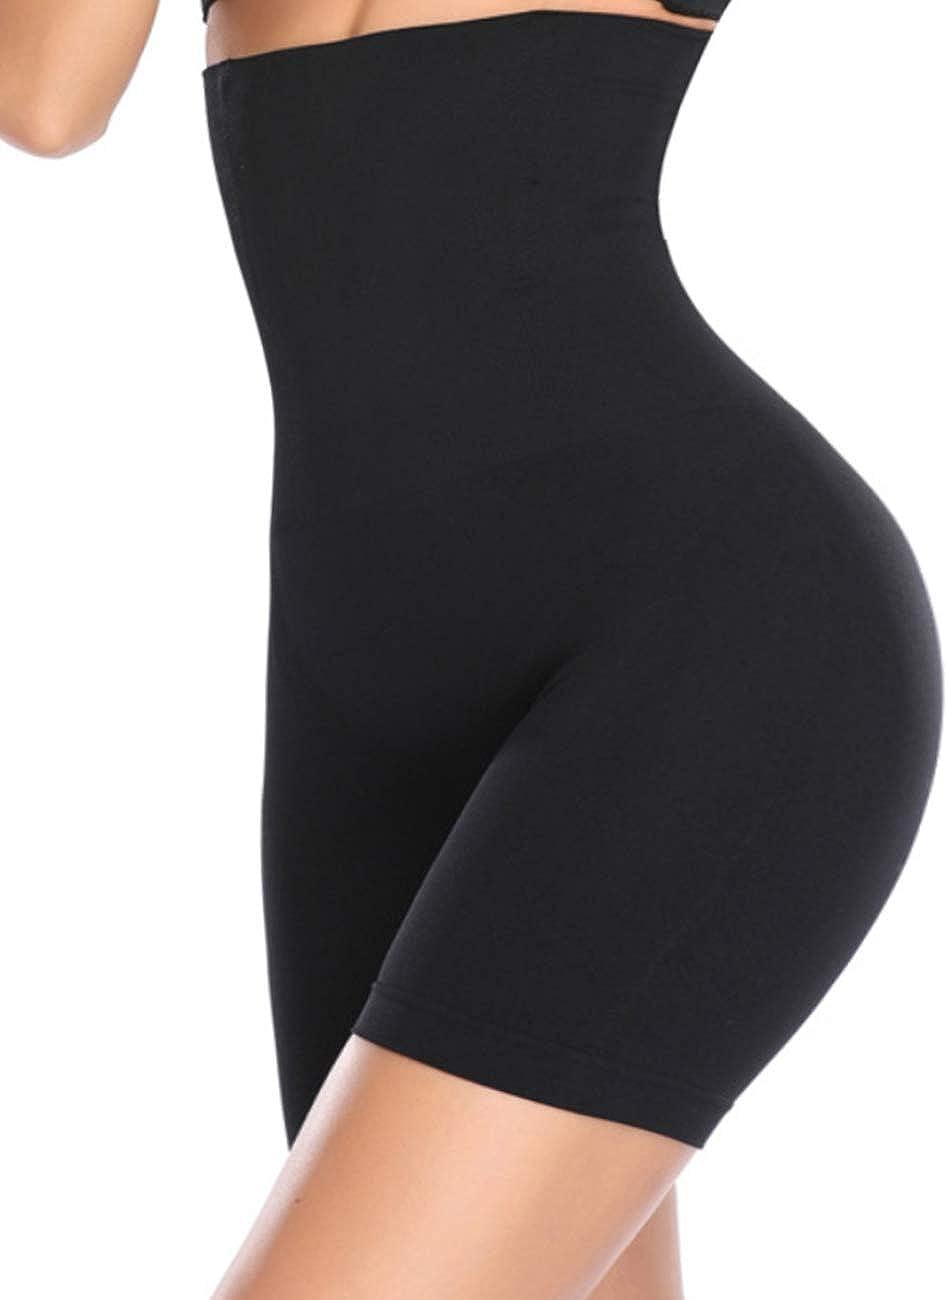 VENDAU Waist Shapewear Power Shorts Compression High Waisted Body Shaper Panties